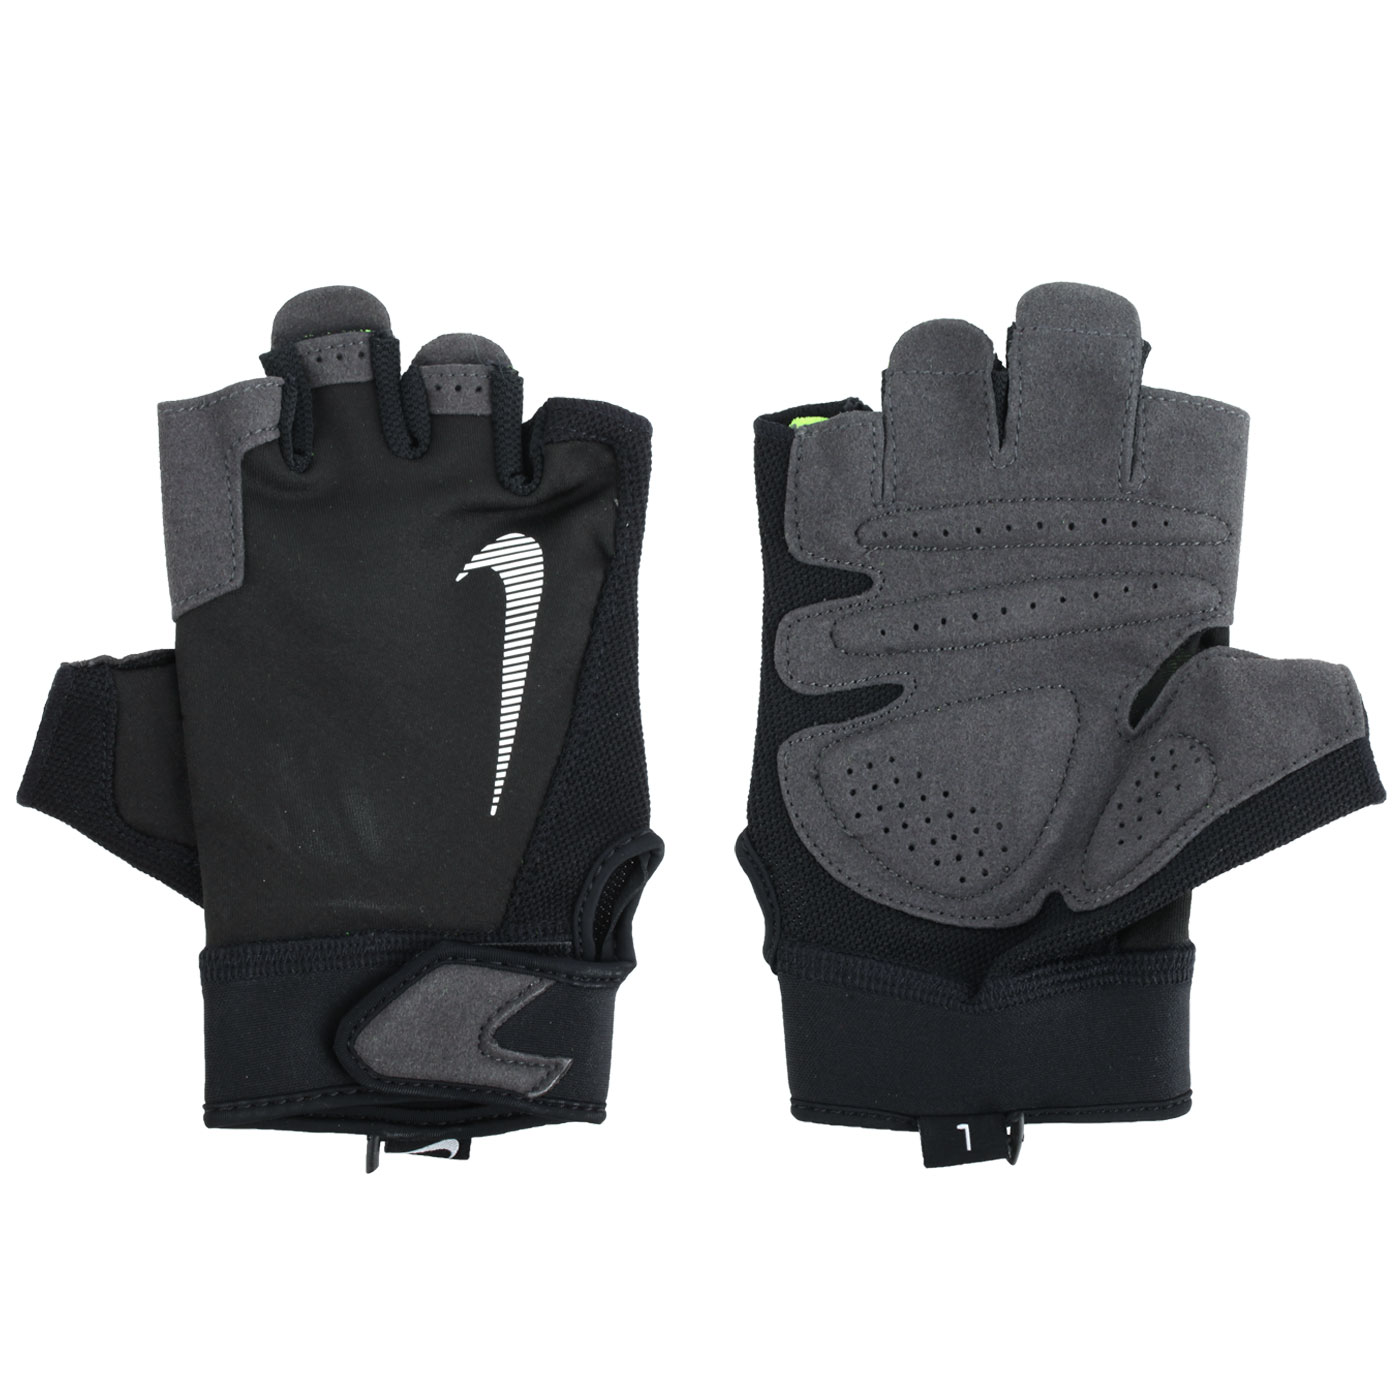 NIKE 男款終極健身手套 NLGC2017LG - 黑白